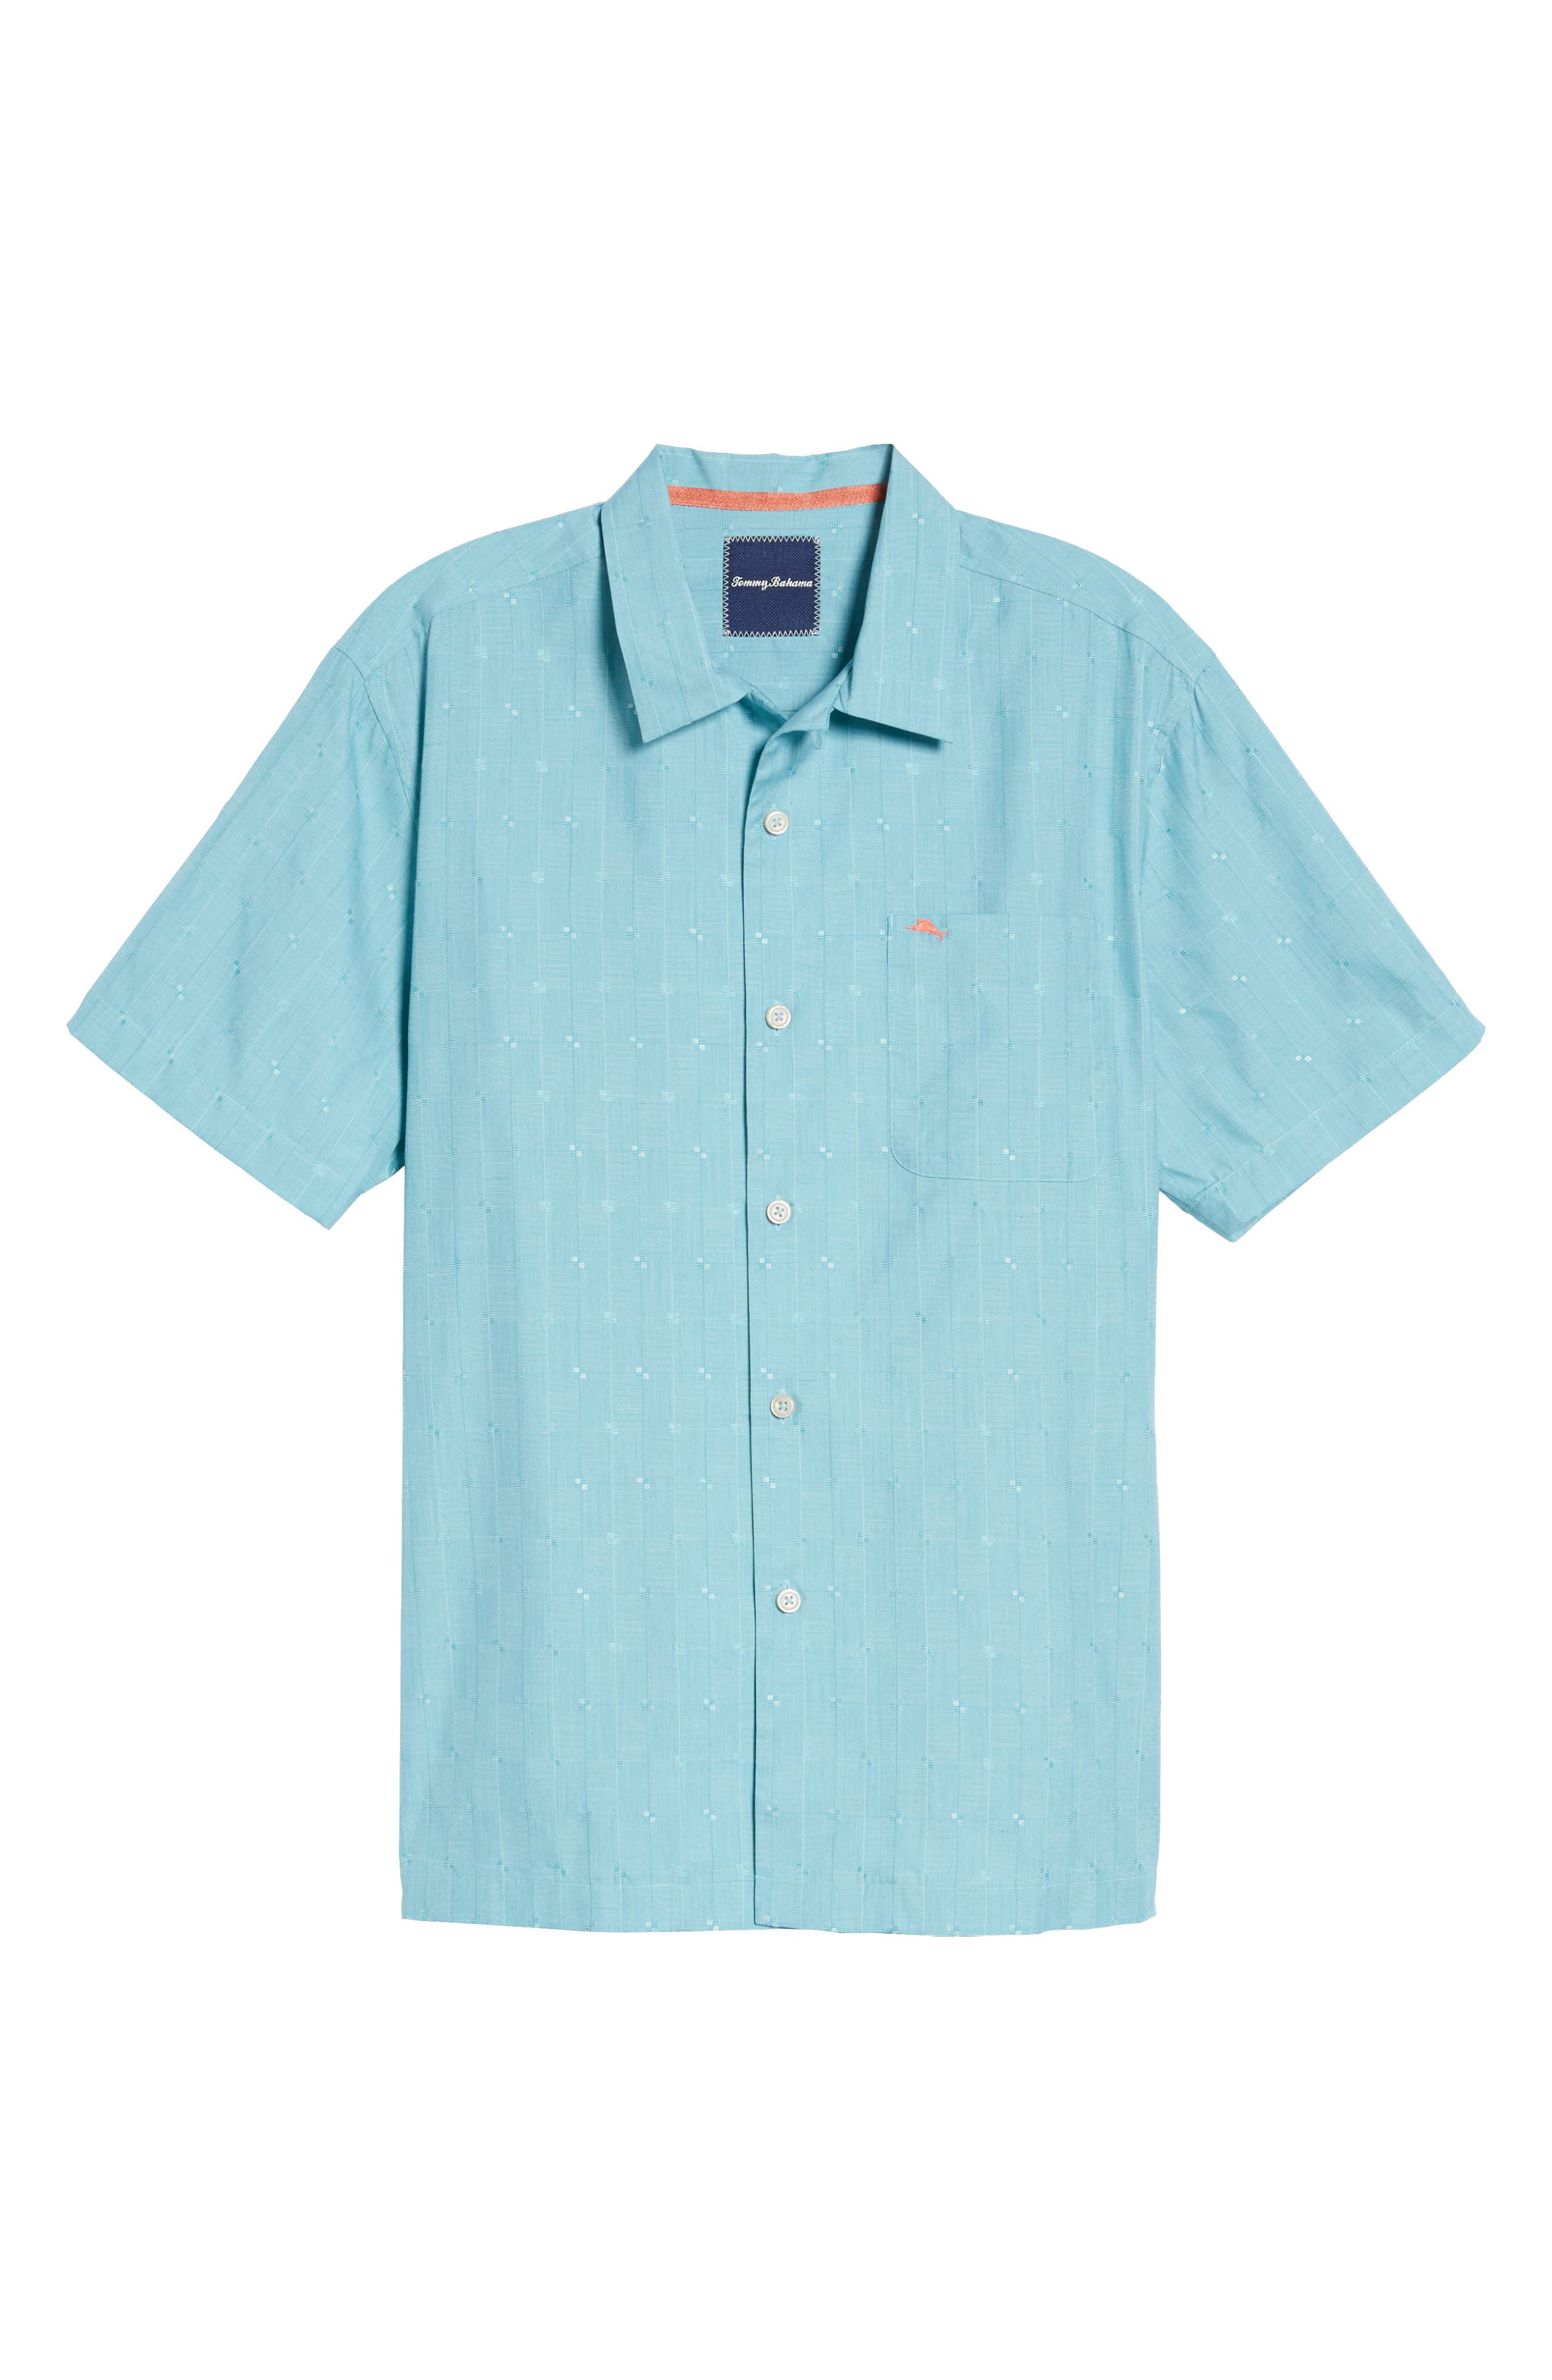 Cypress Sands Camp Shirt,                             Alternate thumbnail 6, color,